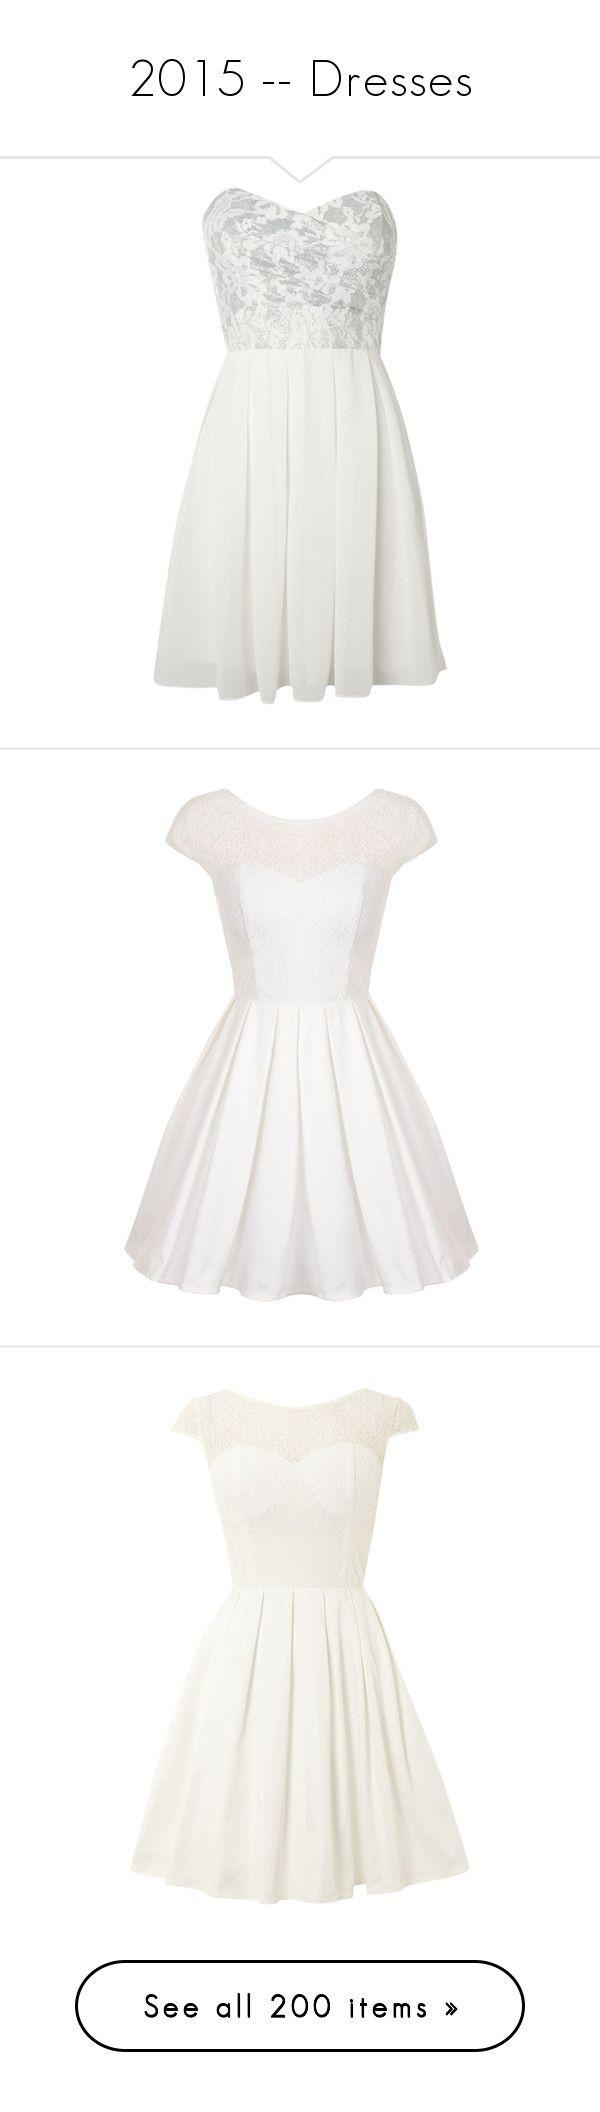 """2015 -- Dresses"" by kyla-perez-santiago ❤ liked on Polyvore featuring dresses, vestidos, short dresses, robes, off white, sale, short floral dresses, champagne cocktail dress, short sweetheart dresses and sweetheart dress"